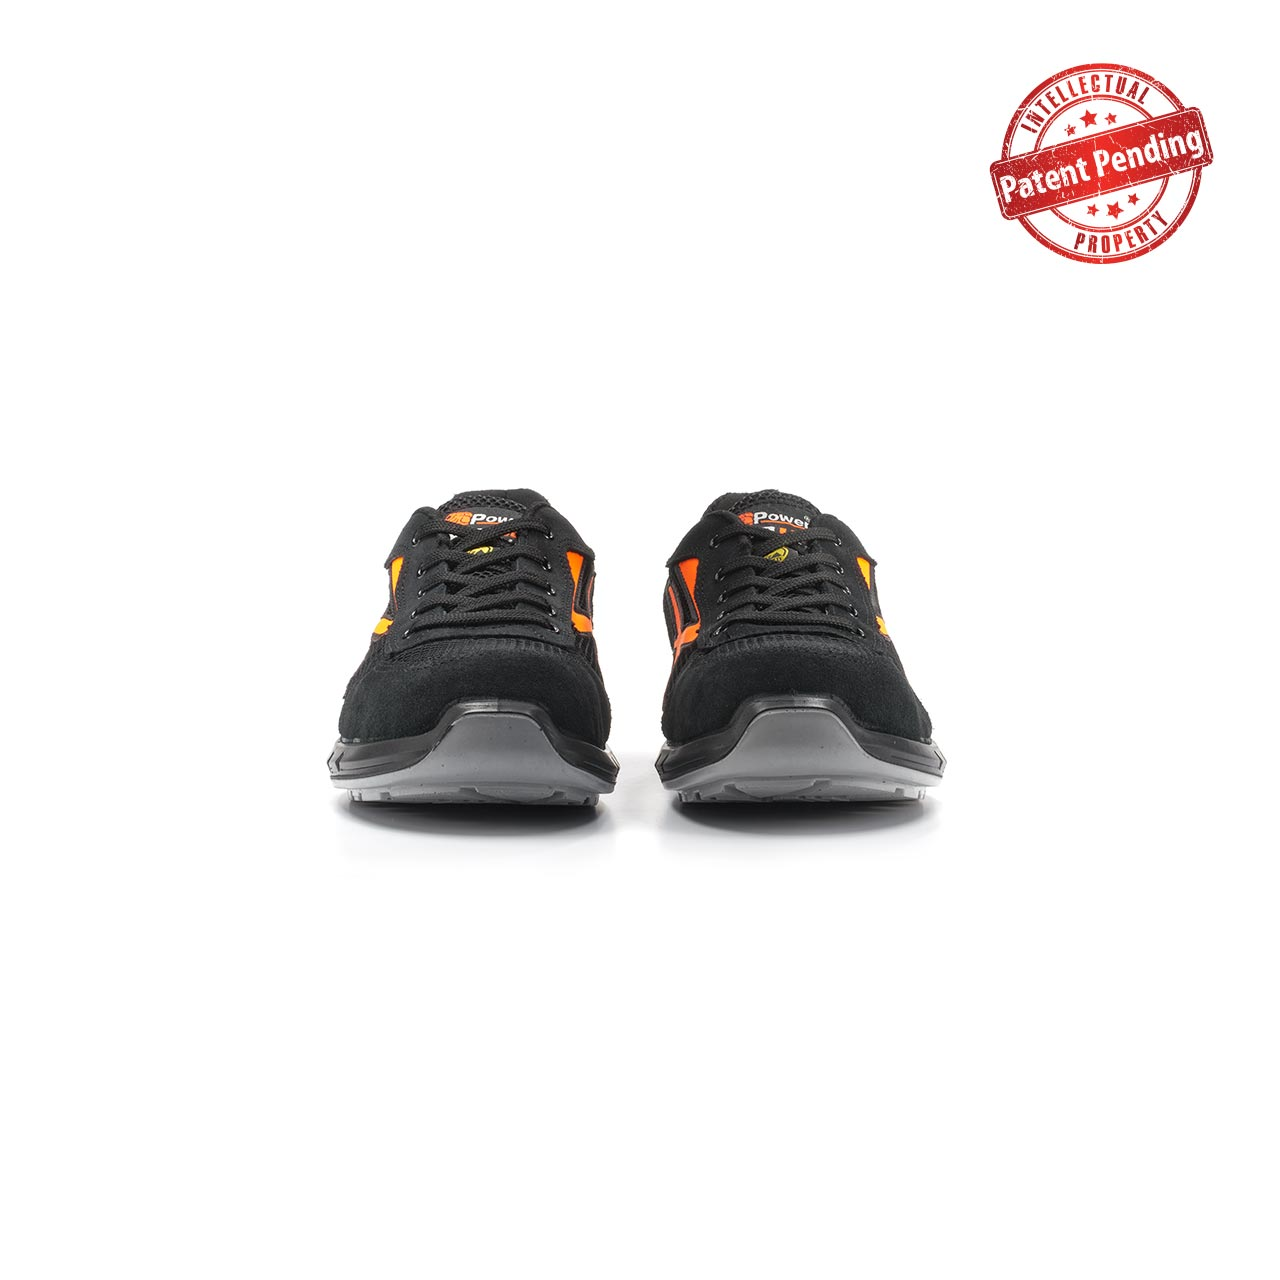 paio di scarpe antinfortunistiche upower modello atos plus linea redup plus vista frontale